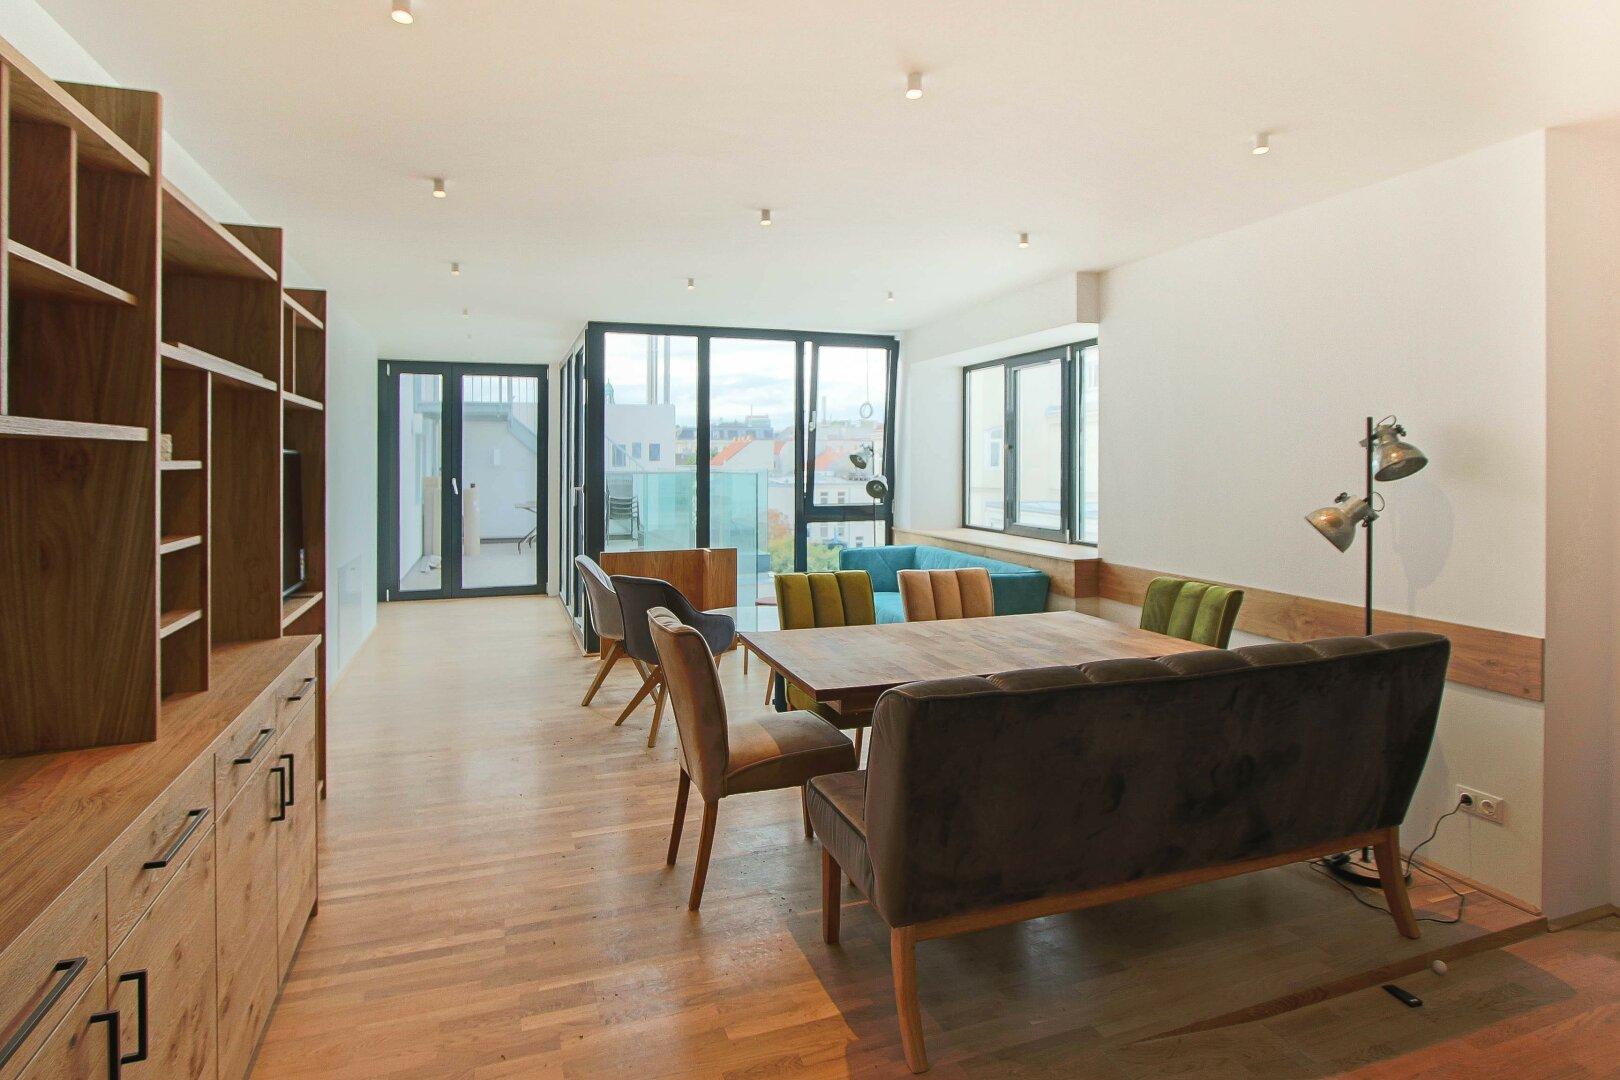 Co-Living Wohnbereich